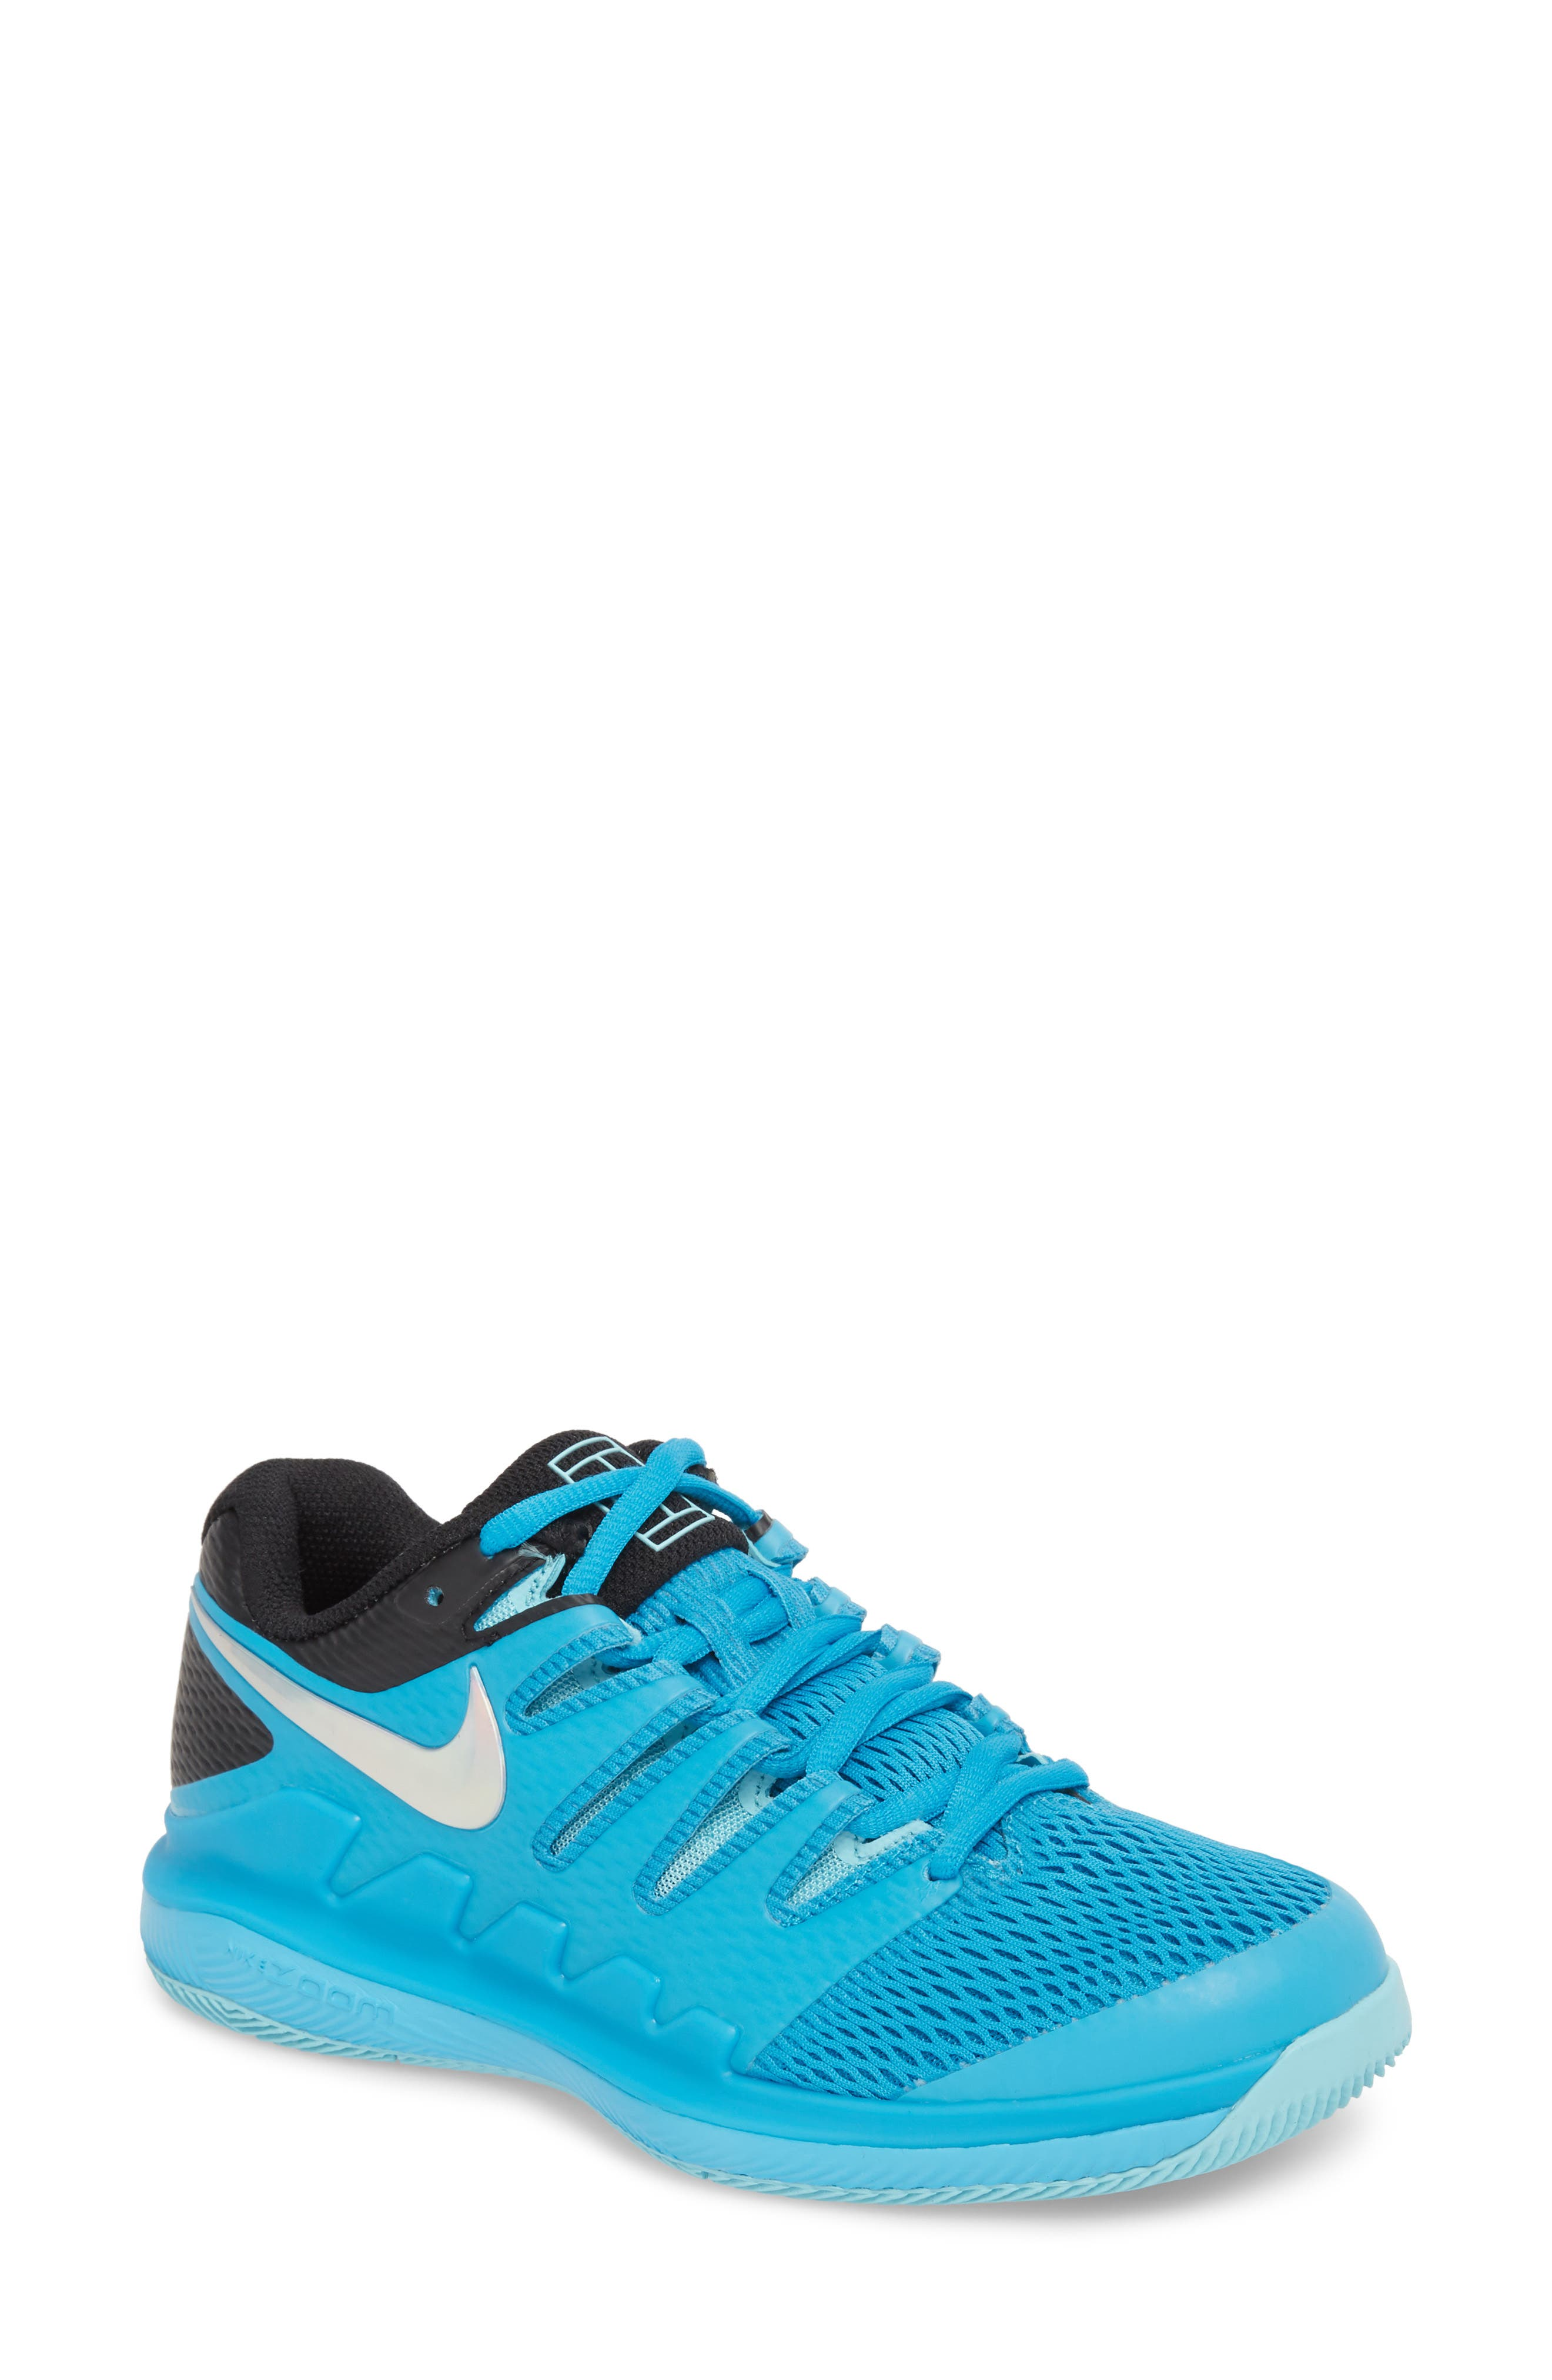 Air Zoom Vapor X Tennis Shoe,                         Main,                         color, Light Blue Fury